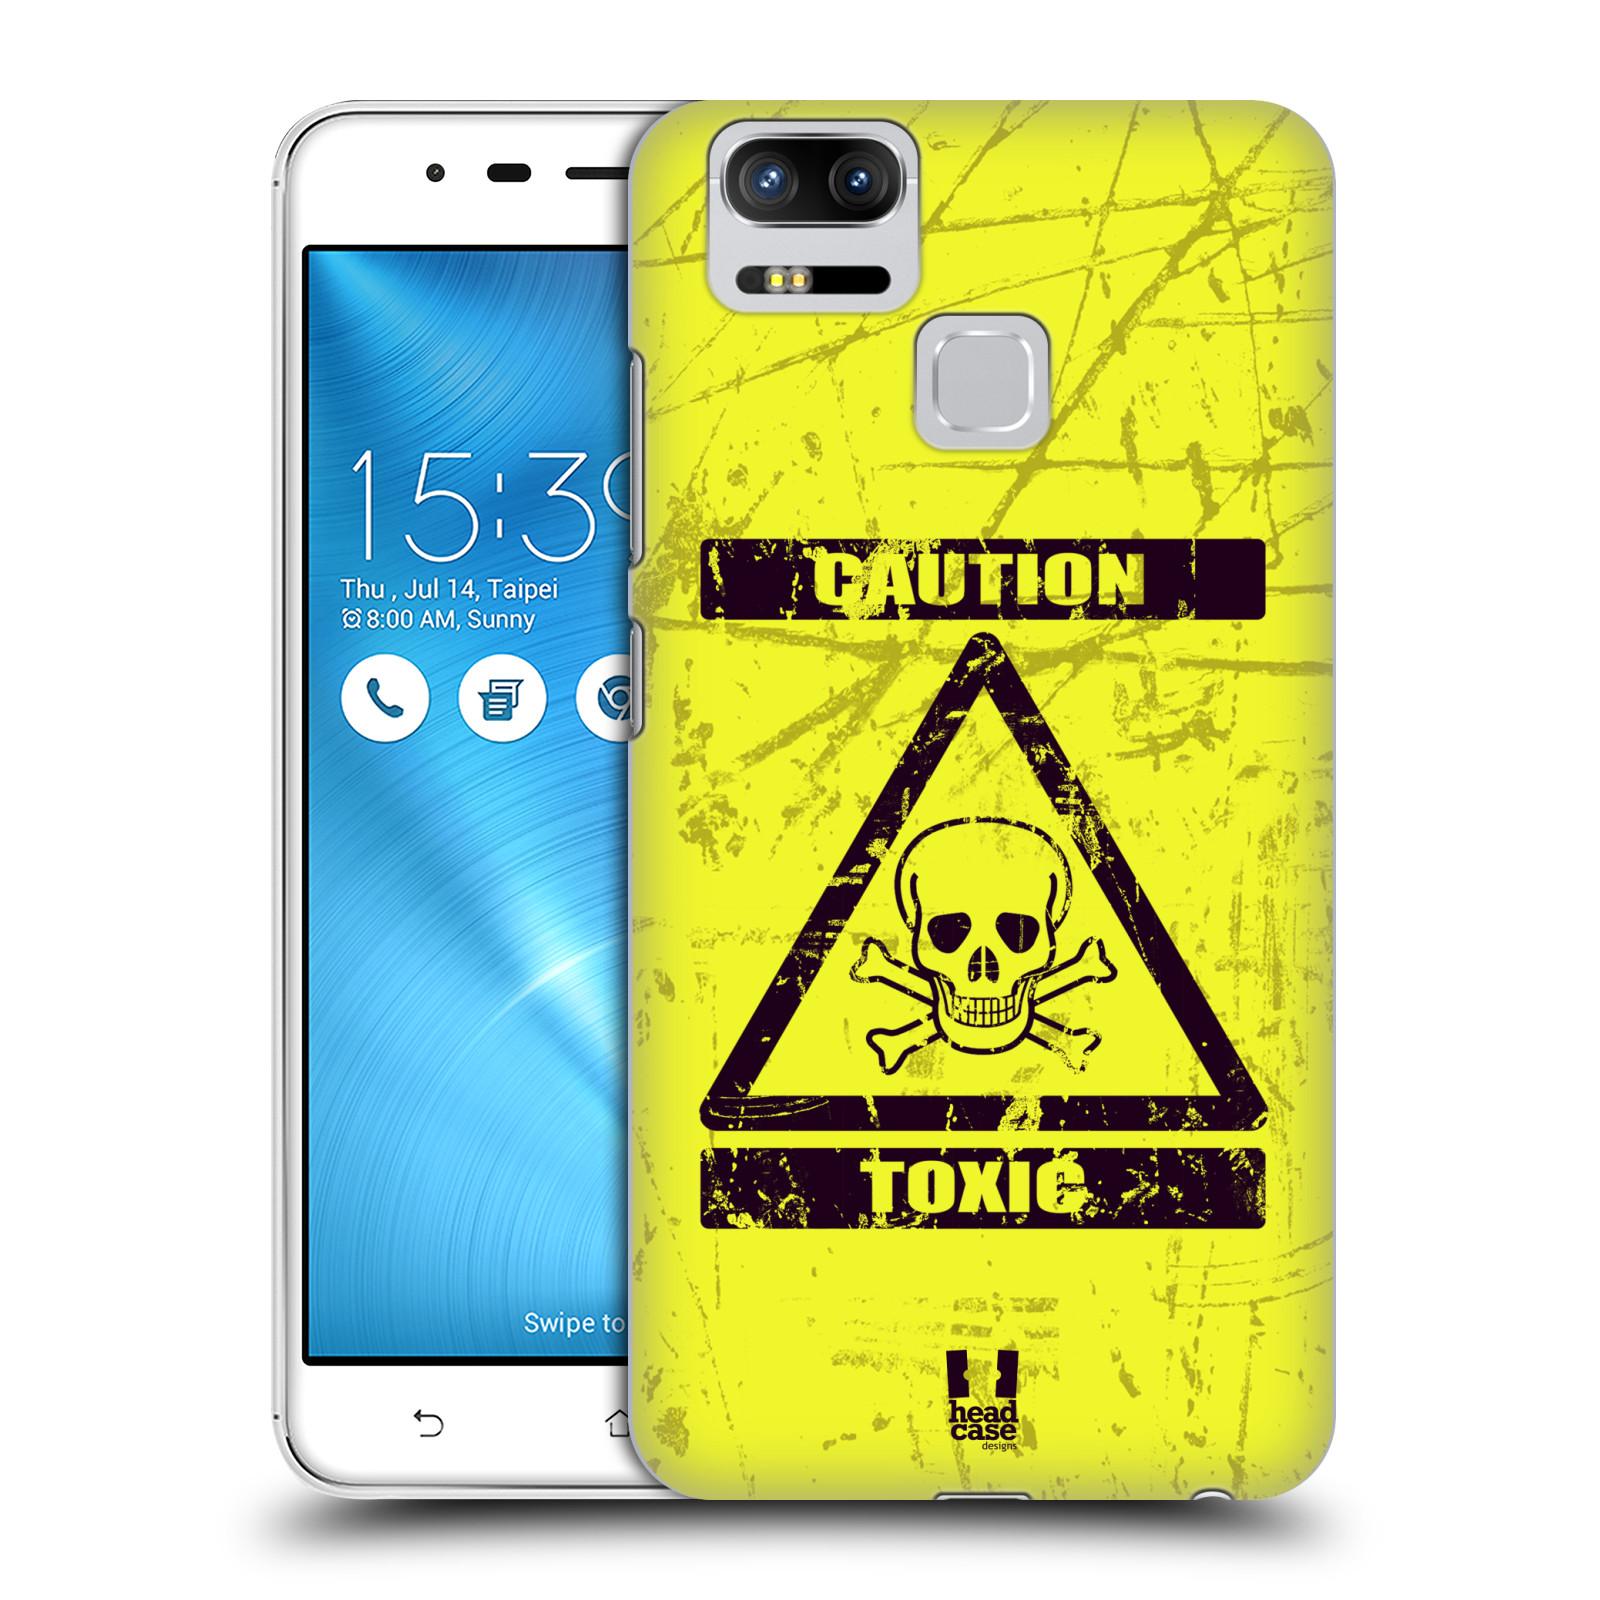 Plastové pouzdro na mobil Asus ZenFone 3 ZOOM ZE553KL - Head Case - TOXIC (Plastový kryt či obal na mobilní telefon Asus ZenFone 3 ZOOM ZE553KL s motivem TOXIC)